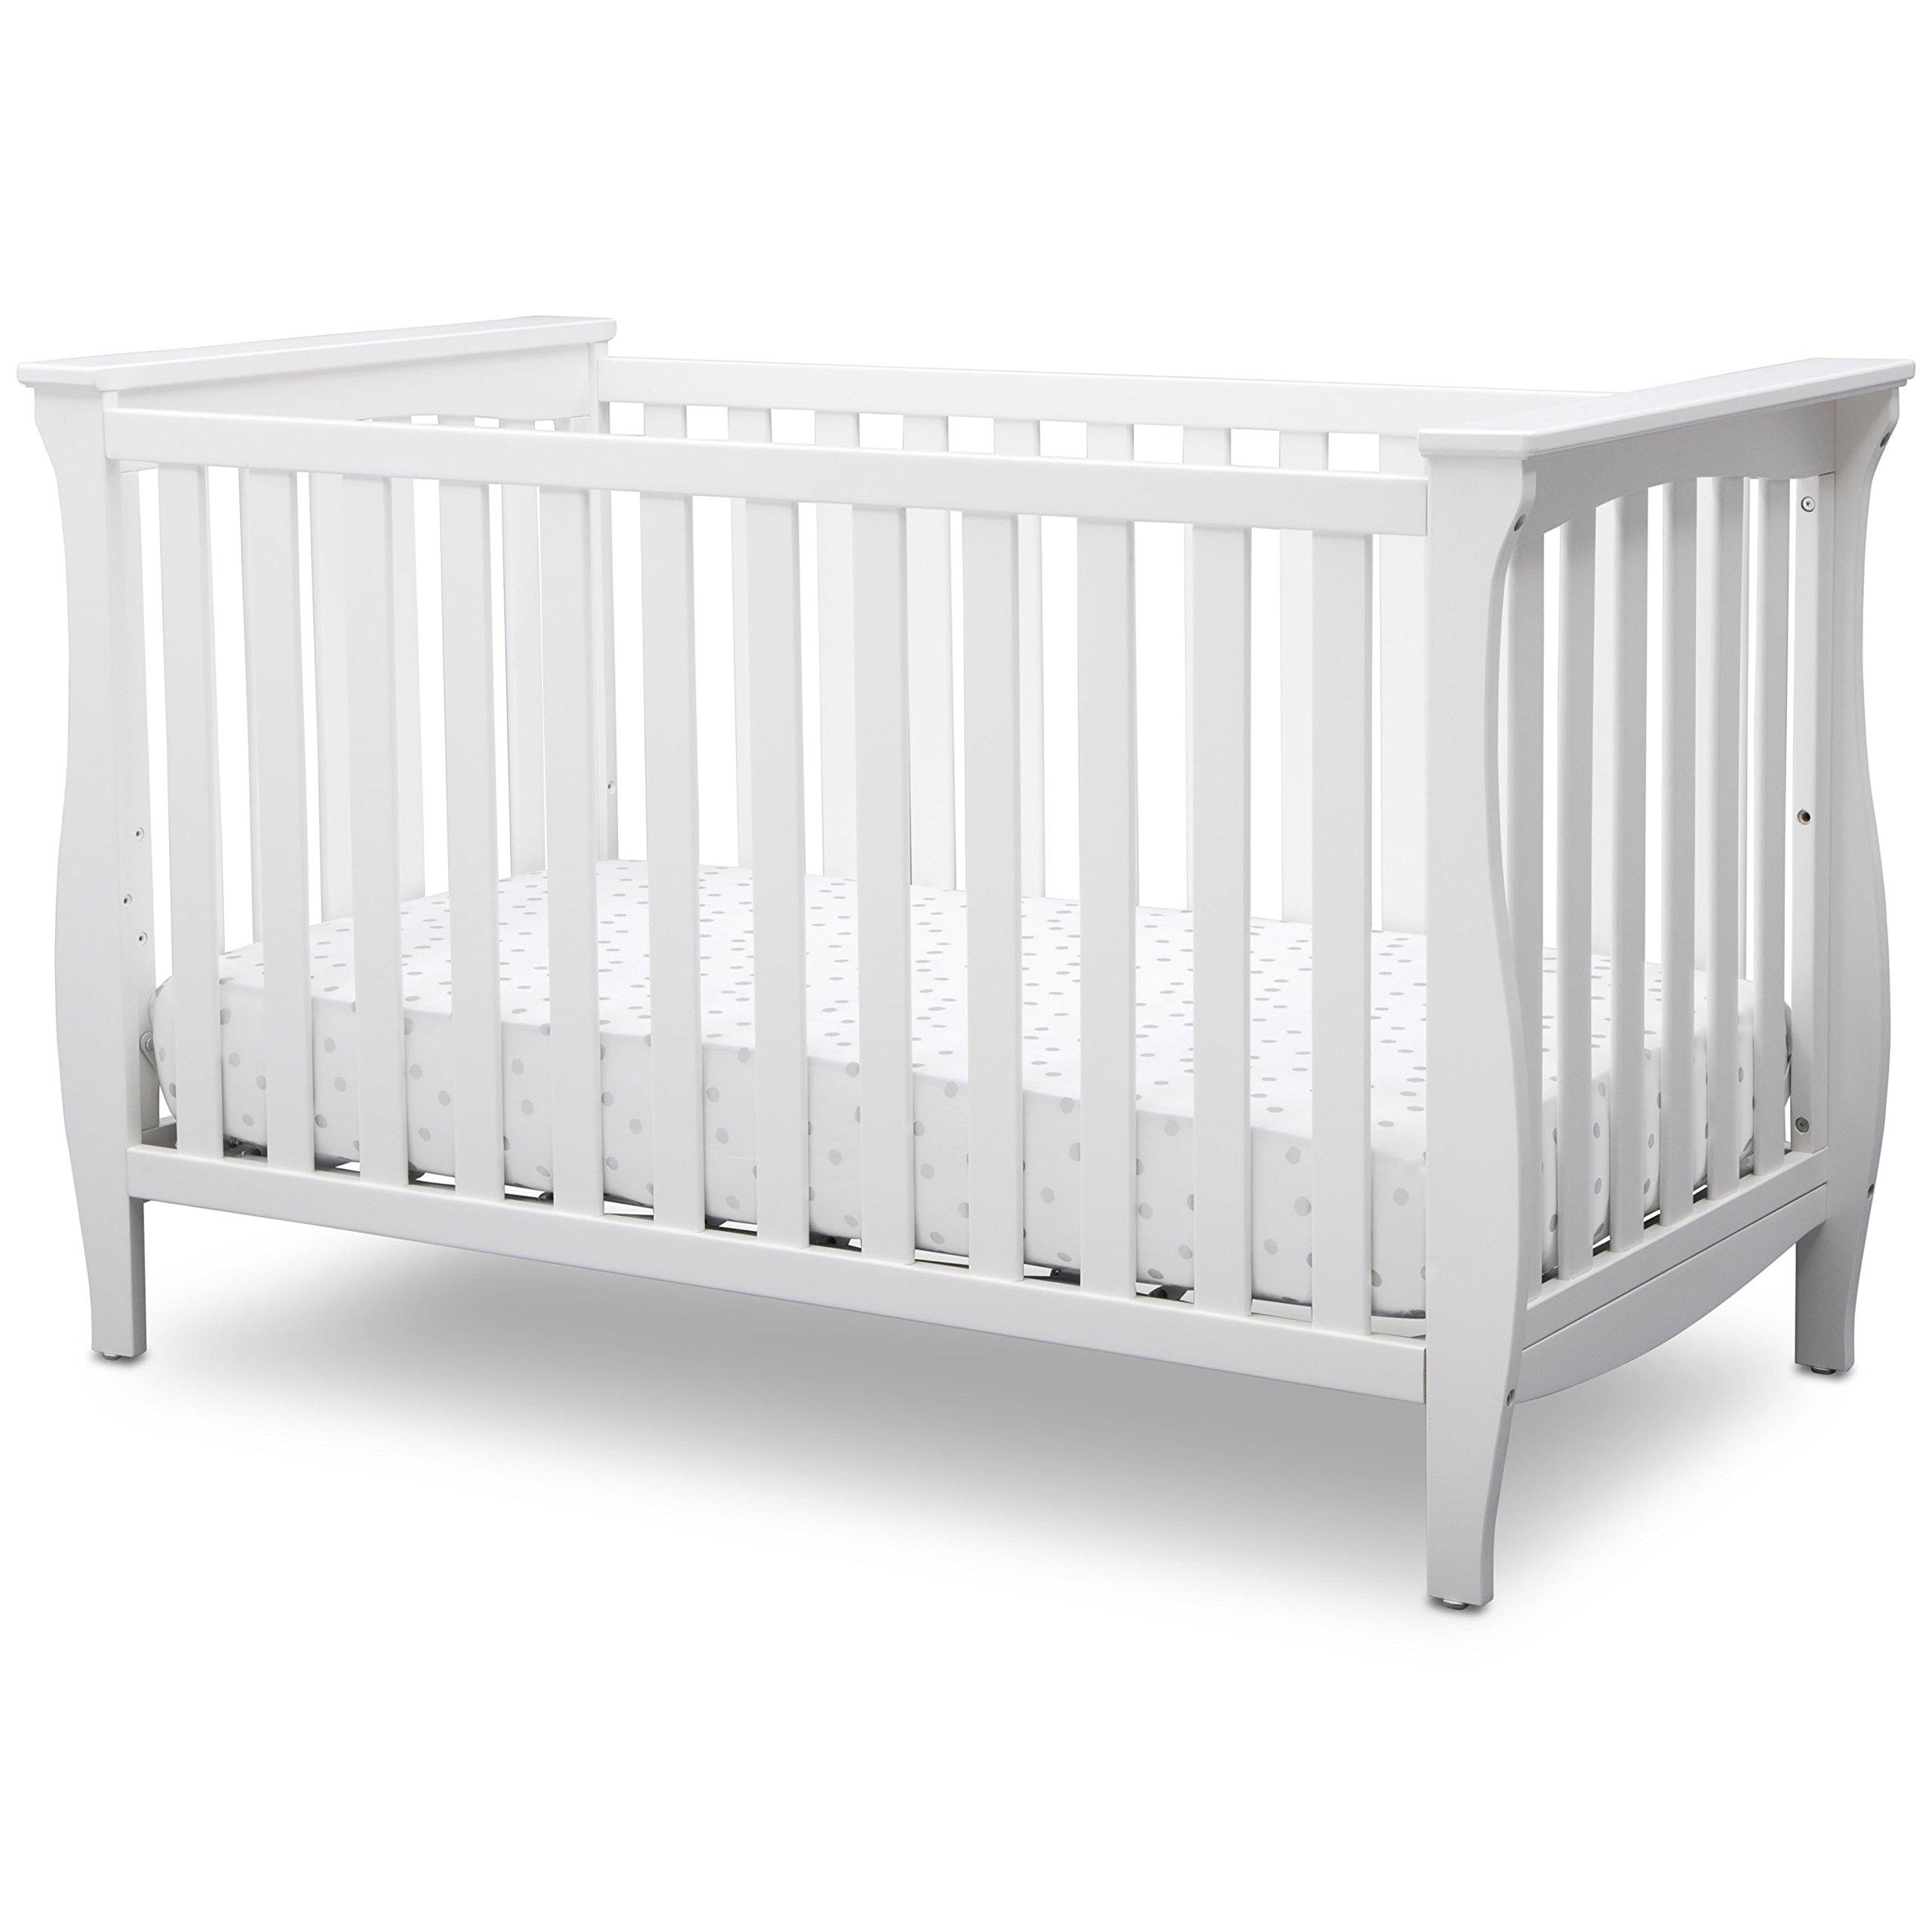 Delta Children Lancaster 3 in 1 Convertible Crib, Bianca White